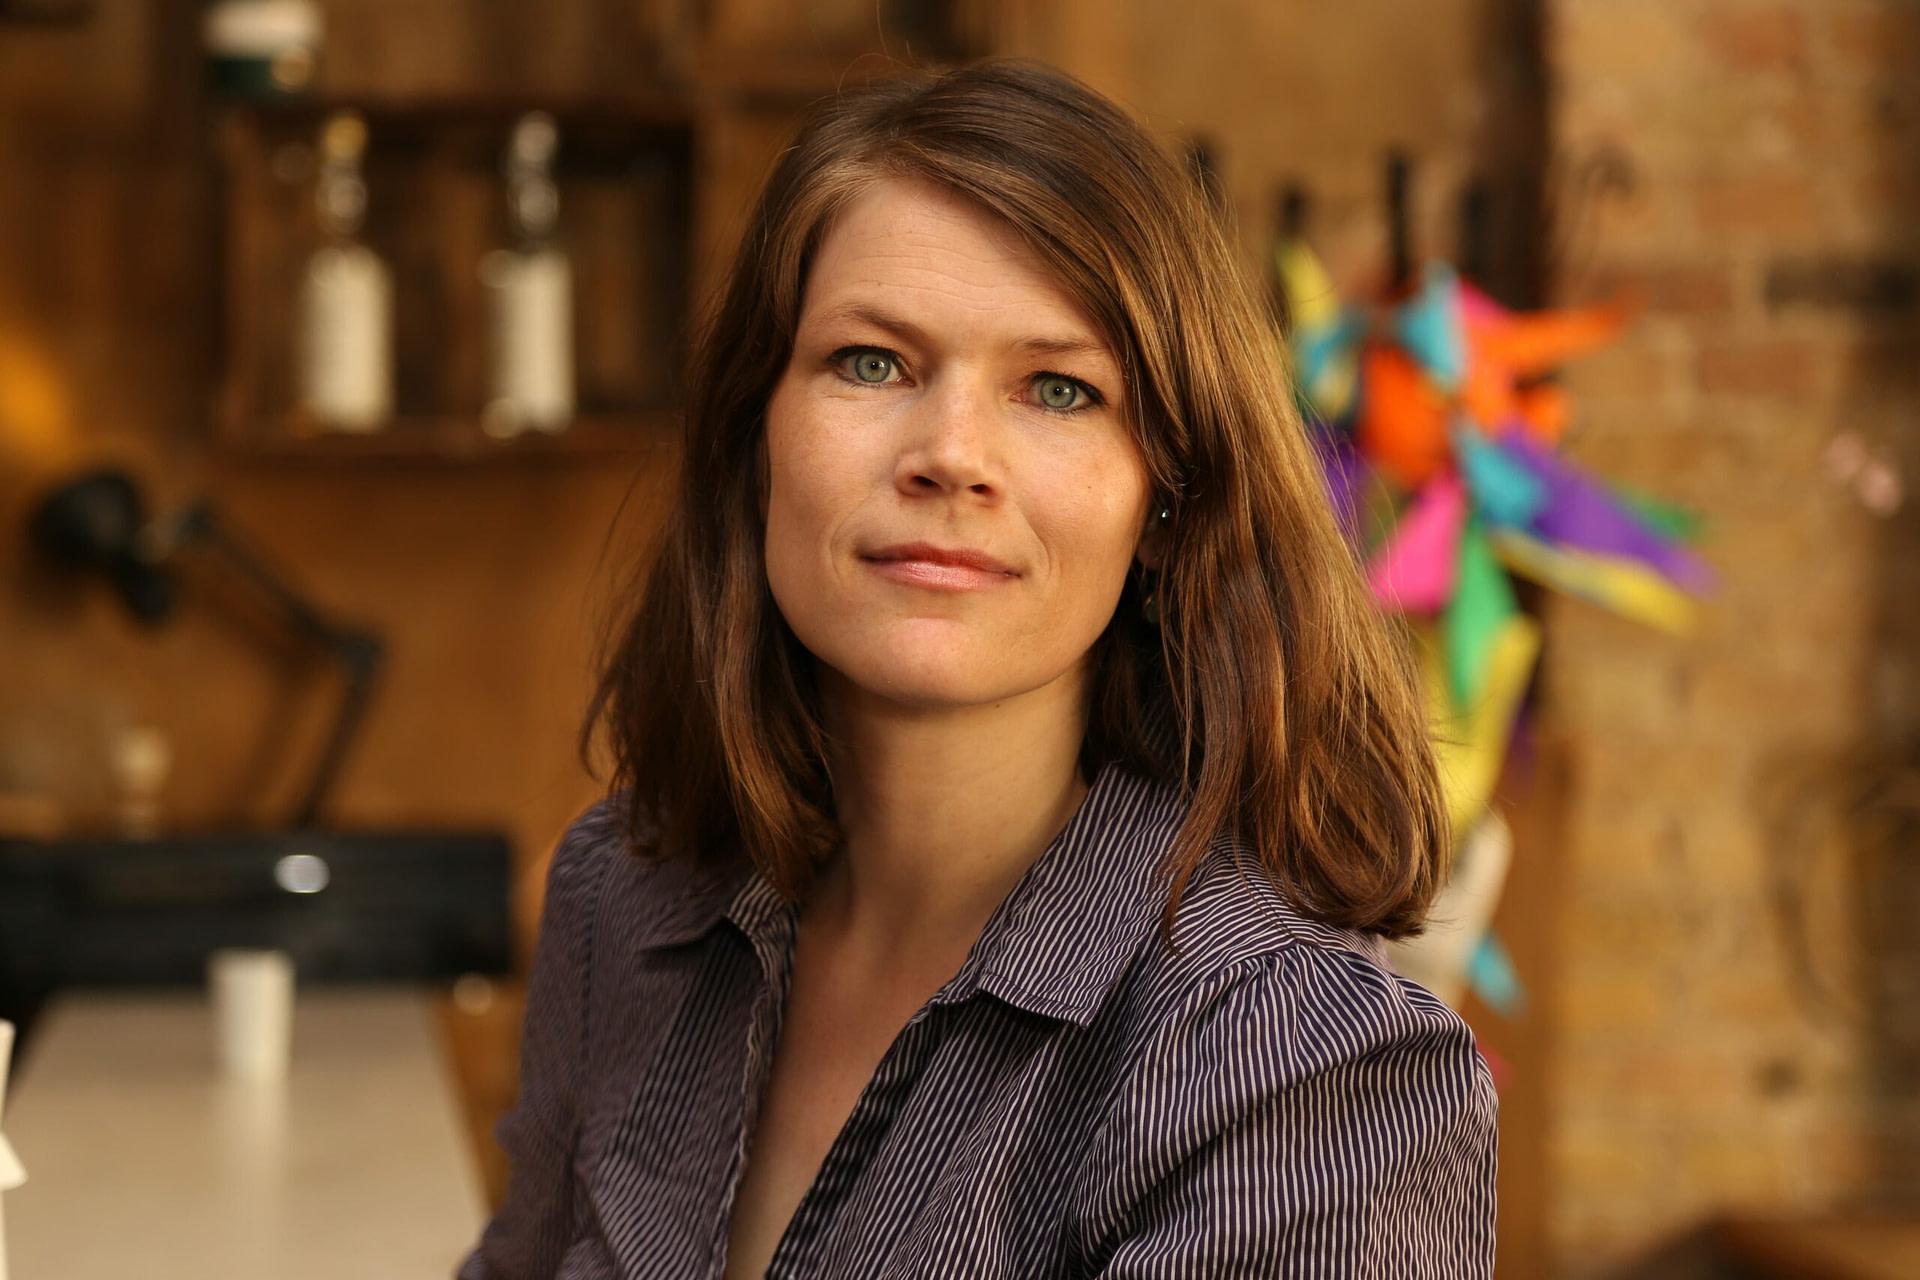 Katrin Elsemann